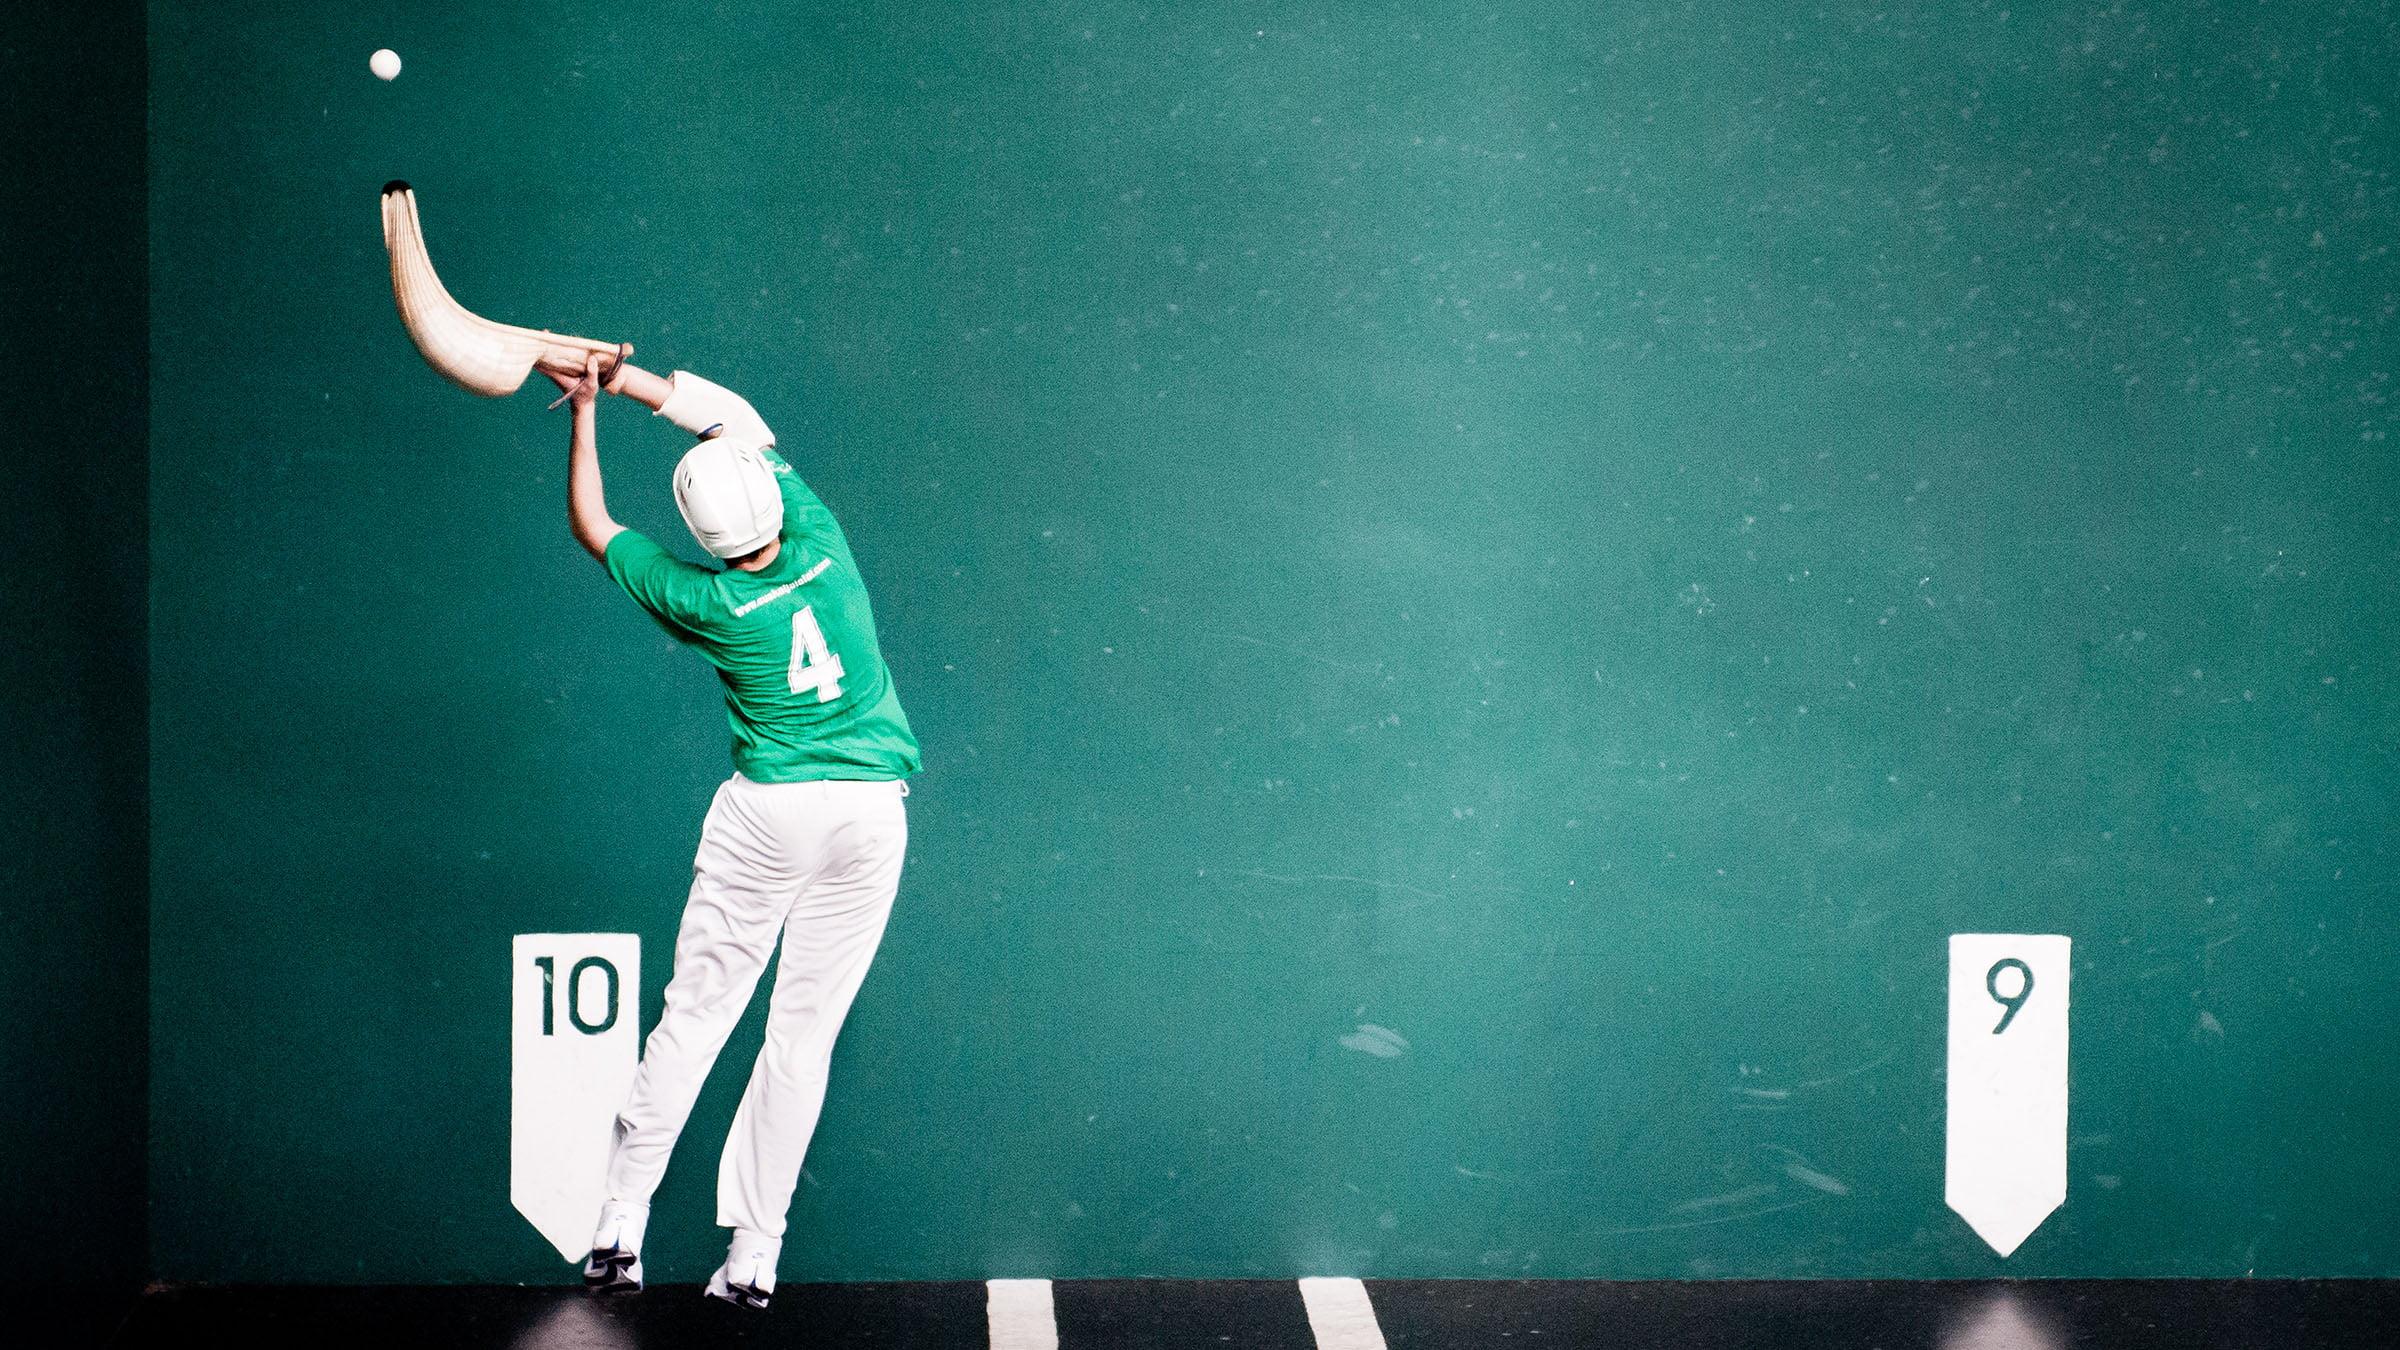 Deportes Vascos en el País Vasco